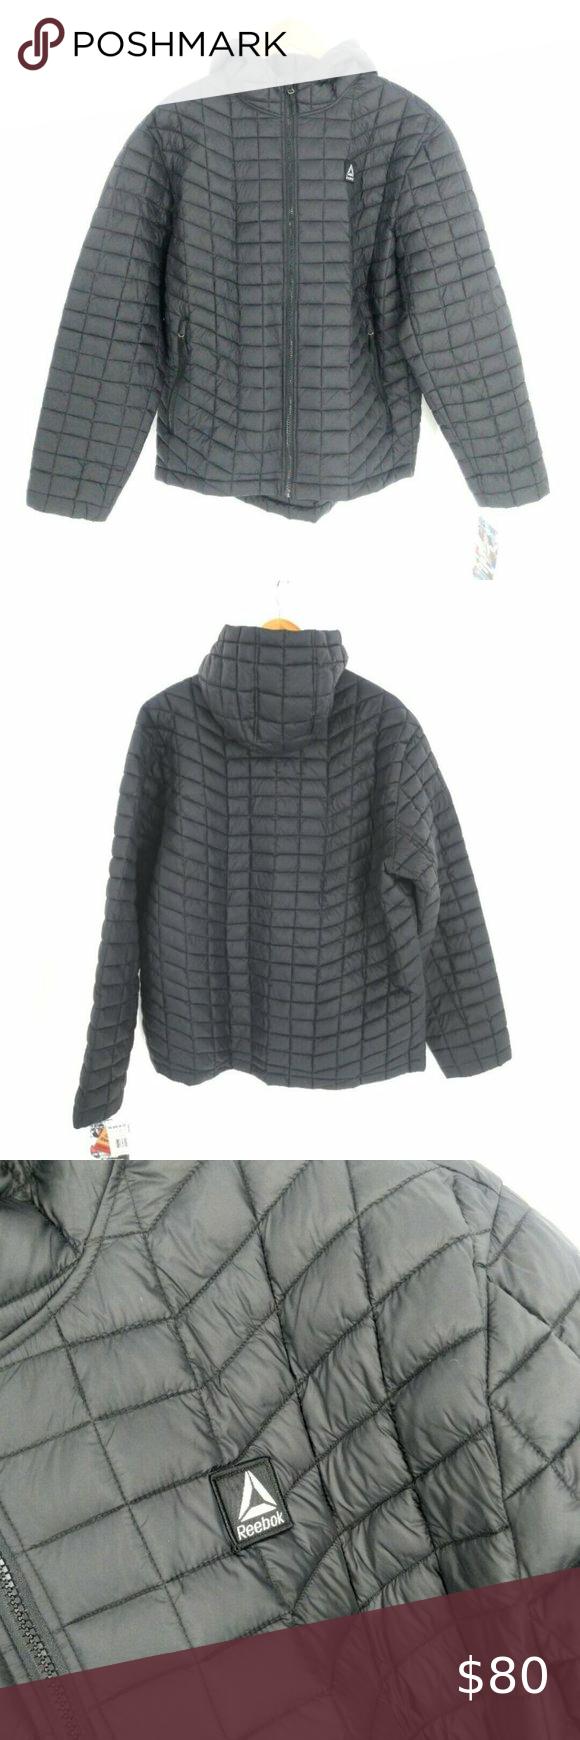 Reebok Puffer Jacket Mens Xl Black Quilted Warm Mens Xl Puffer Jackets Mens Jackets [ 1740 x 580 Pixel ]